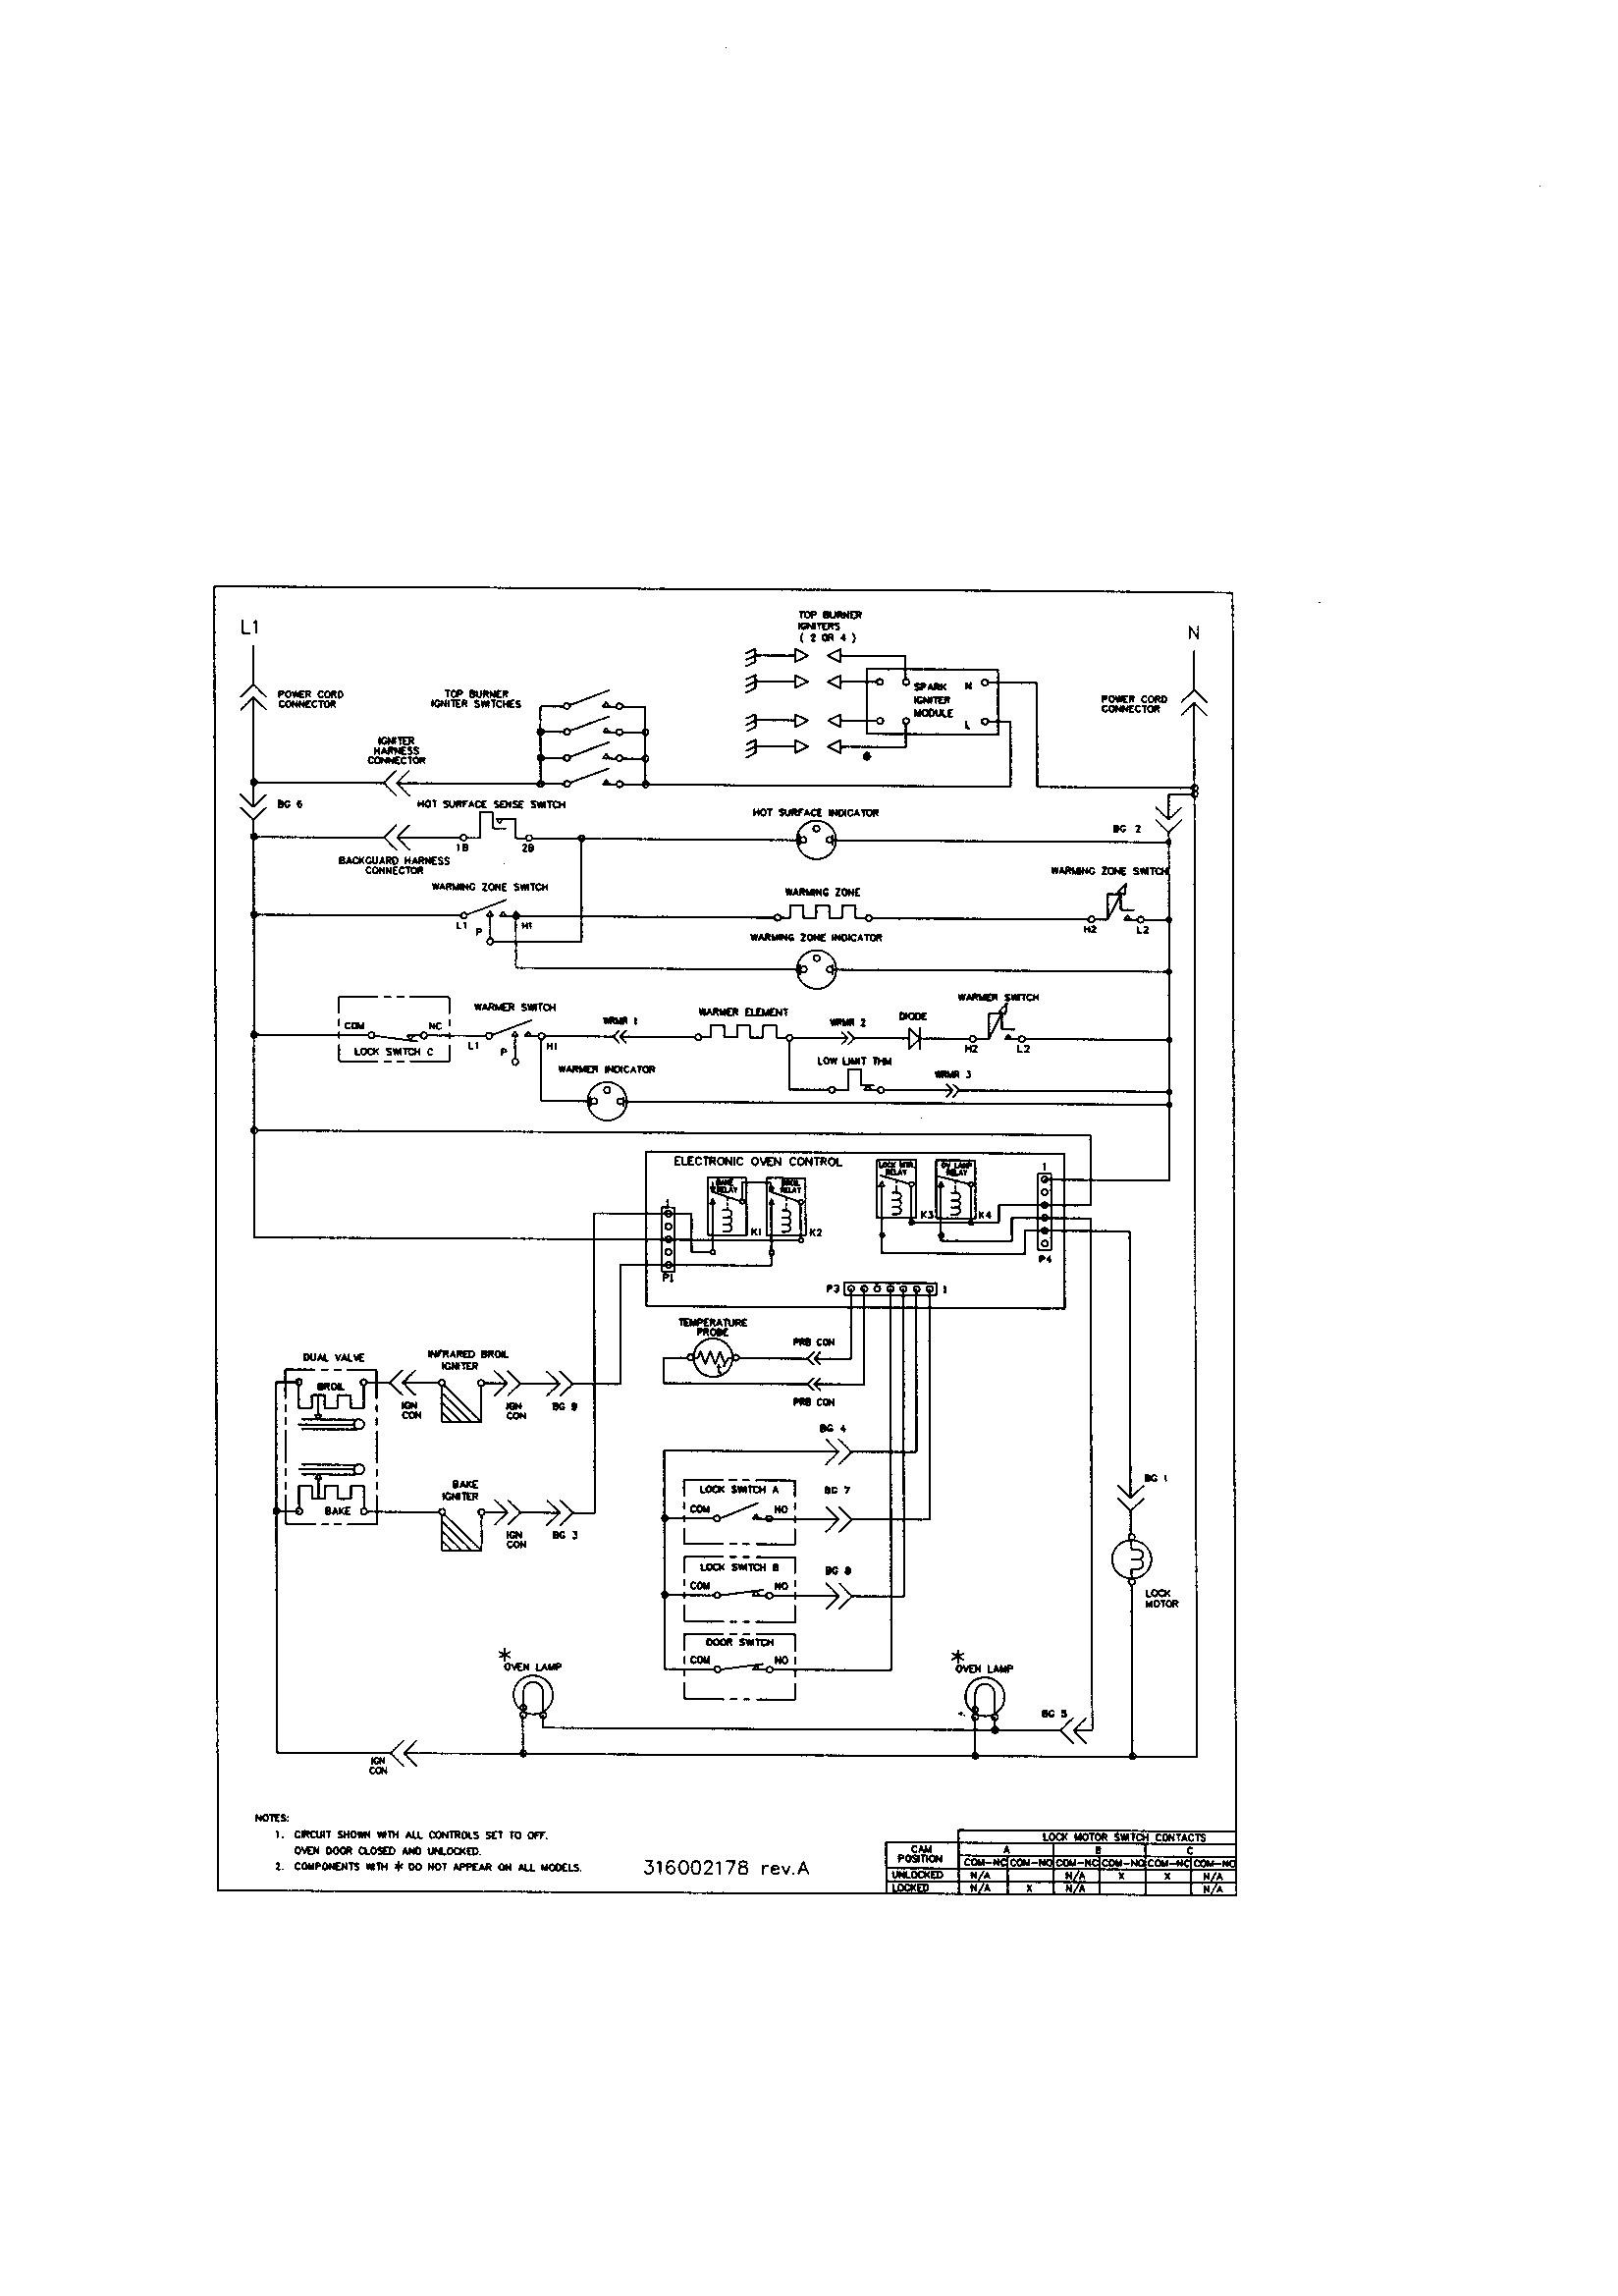 panasonic ac wiring diagram